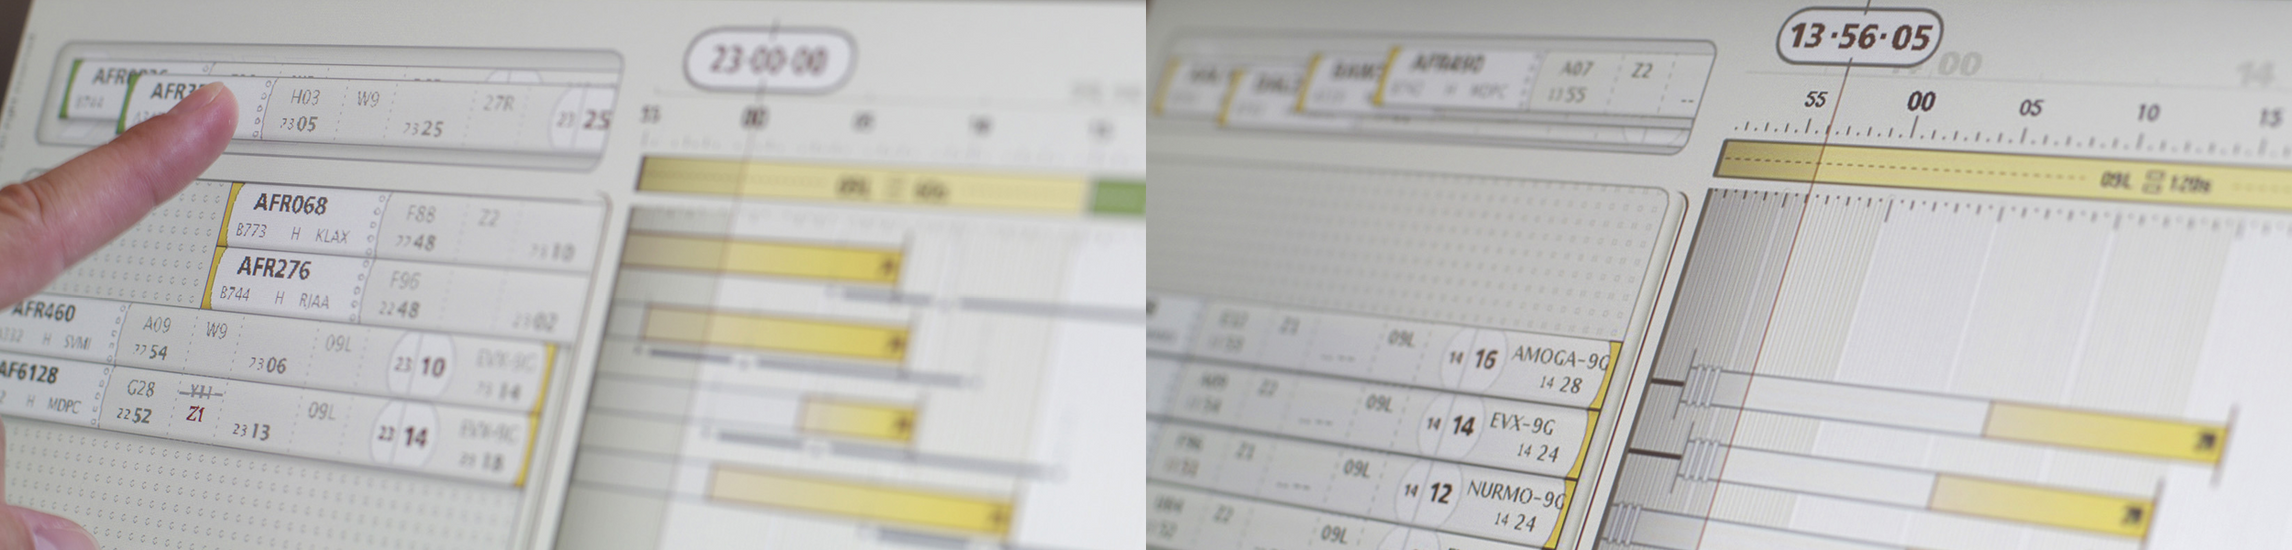 Design interface contrôle aérien